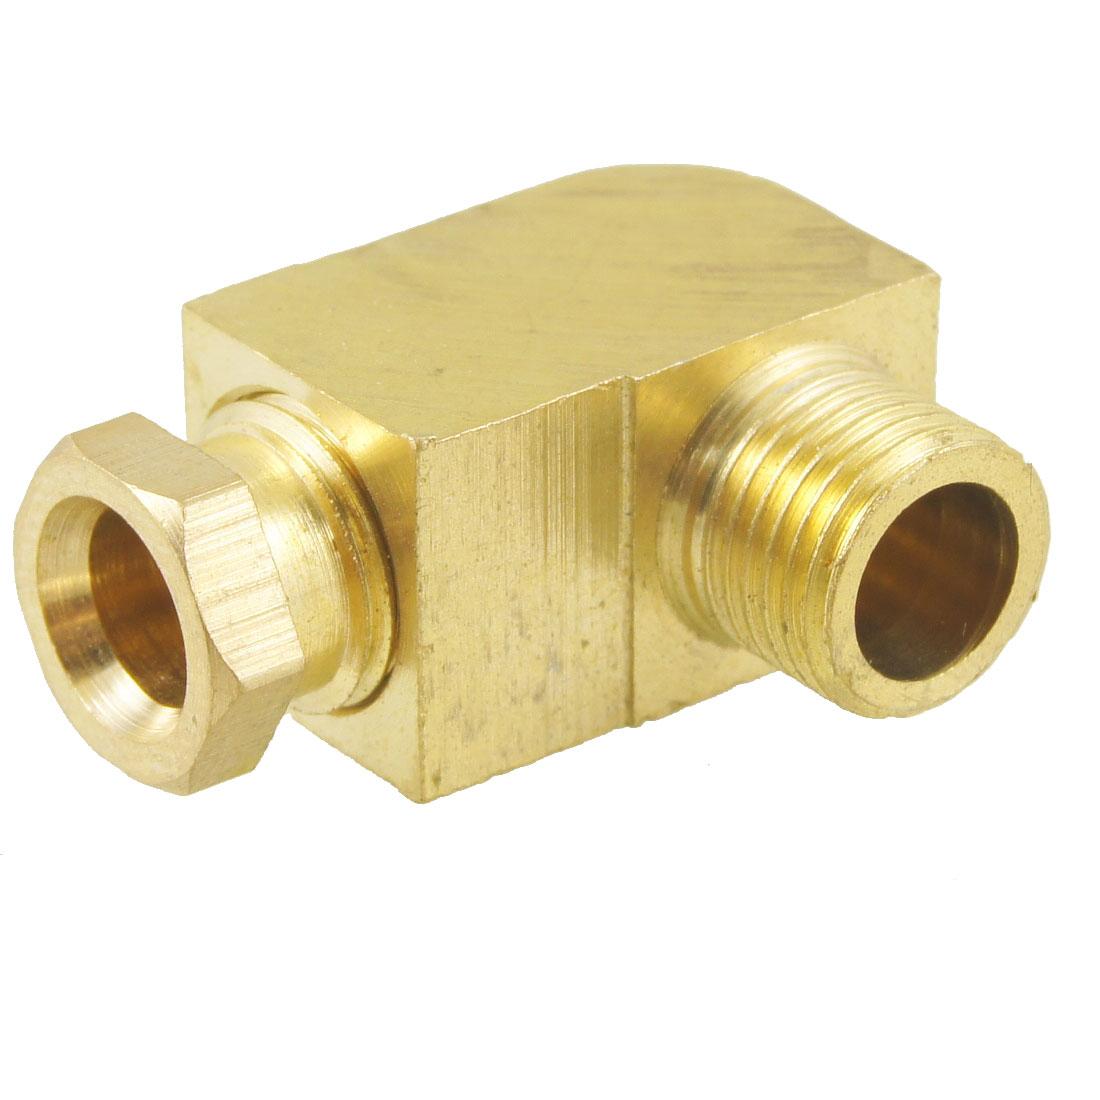 "6mm Hole Dia 1/8"" Male Thread 90 Degree Metal Hydraulic Grease Nipple Fitting"